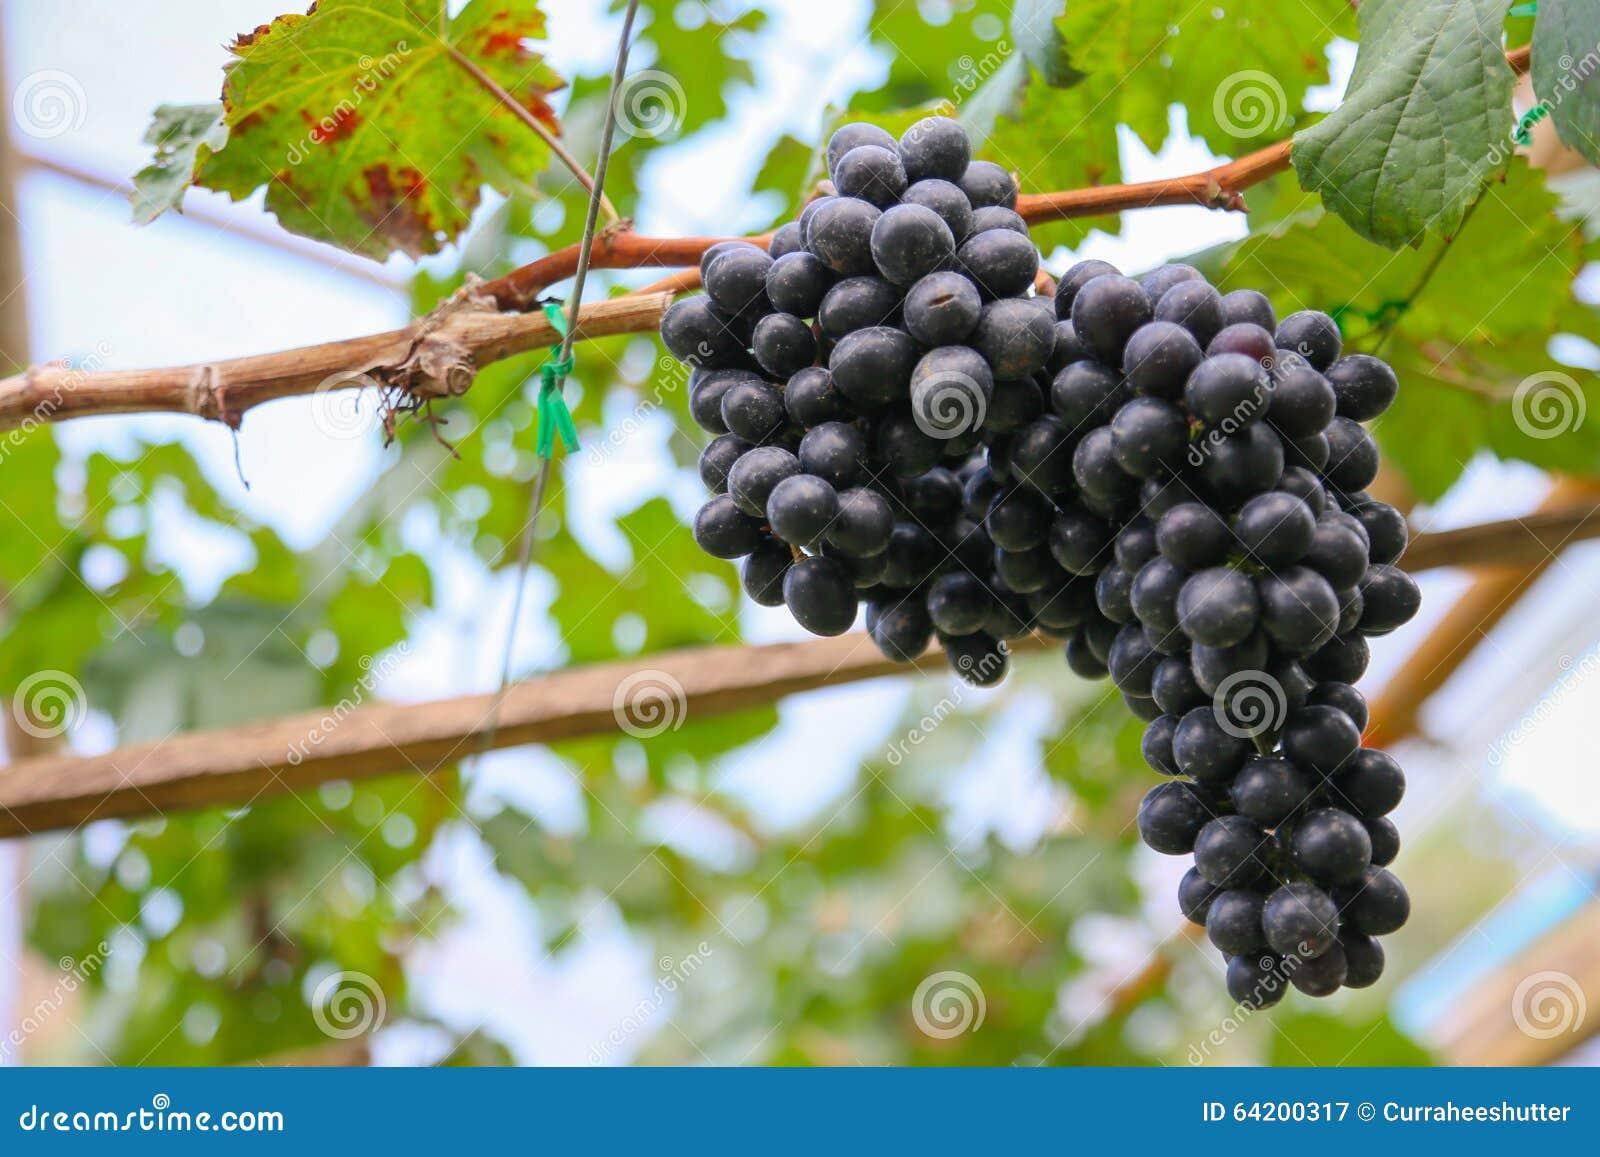 Fruta fresca de la baya o de la uva en huerta, fruta limpia o fondo popular de la fruta, fruta del mercado de la huerta de la agr